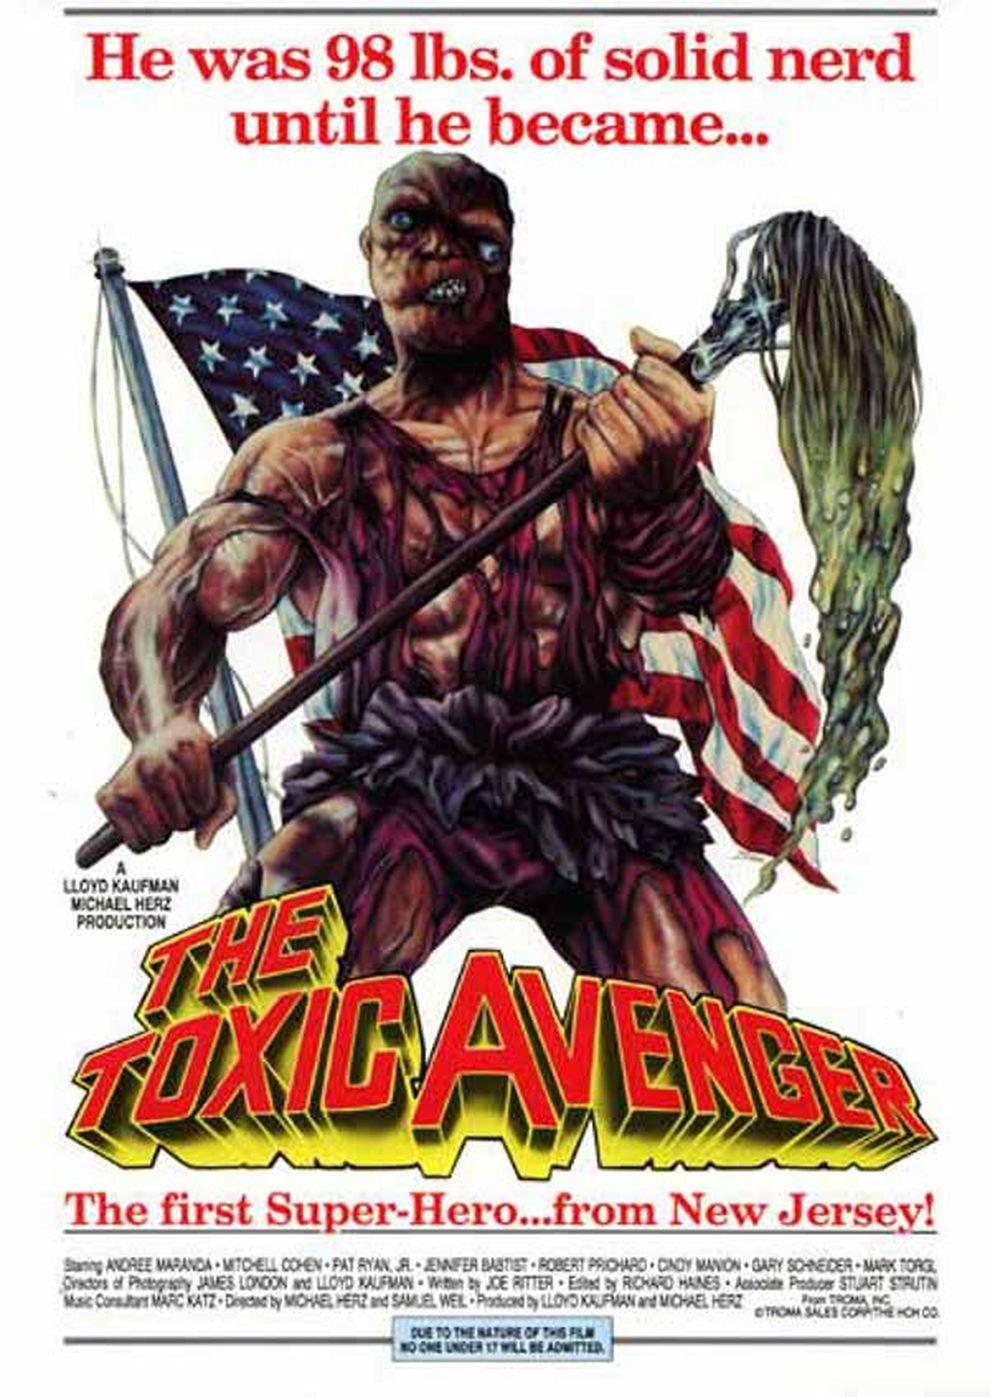 Atomic Hero - The Toxic Avenger (Poster)